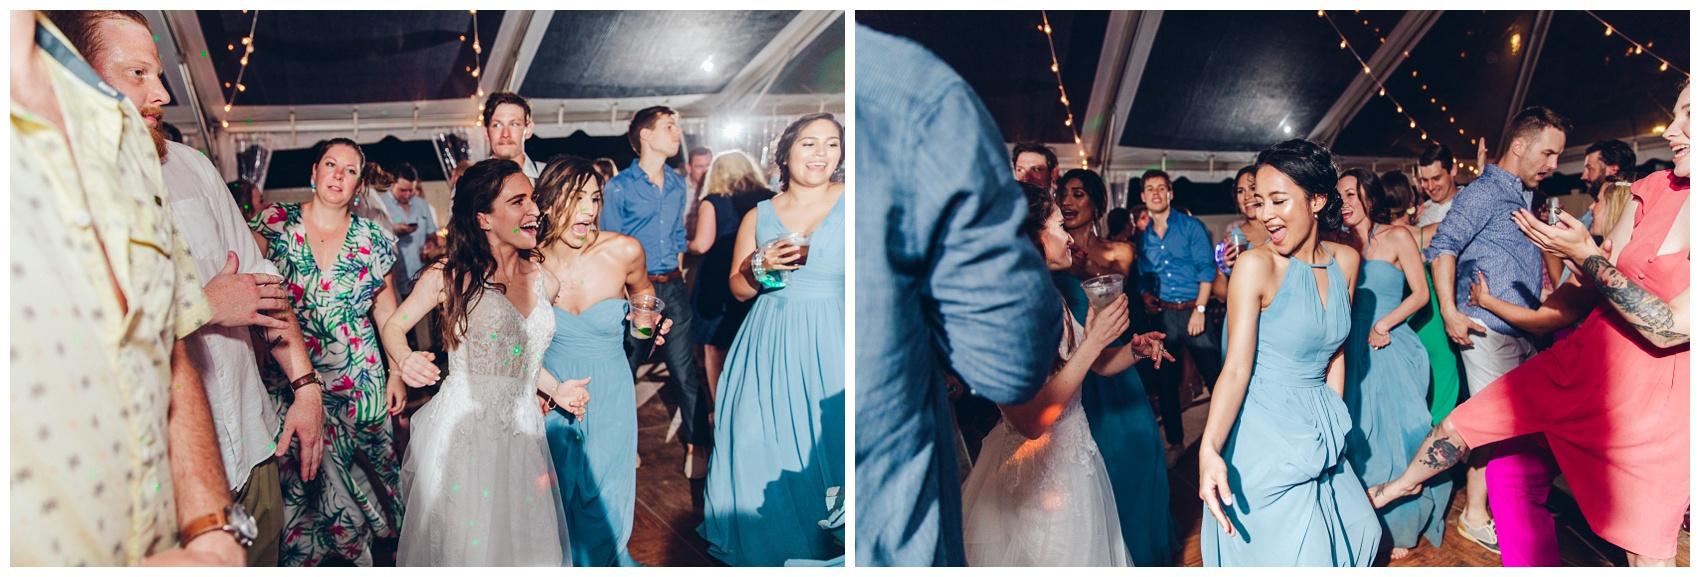 Outer-Banks-Corolla-Wedding_0130.jpg